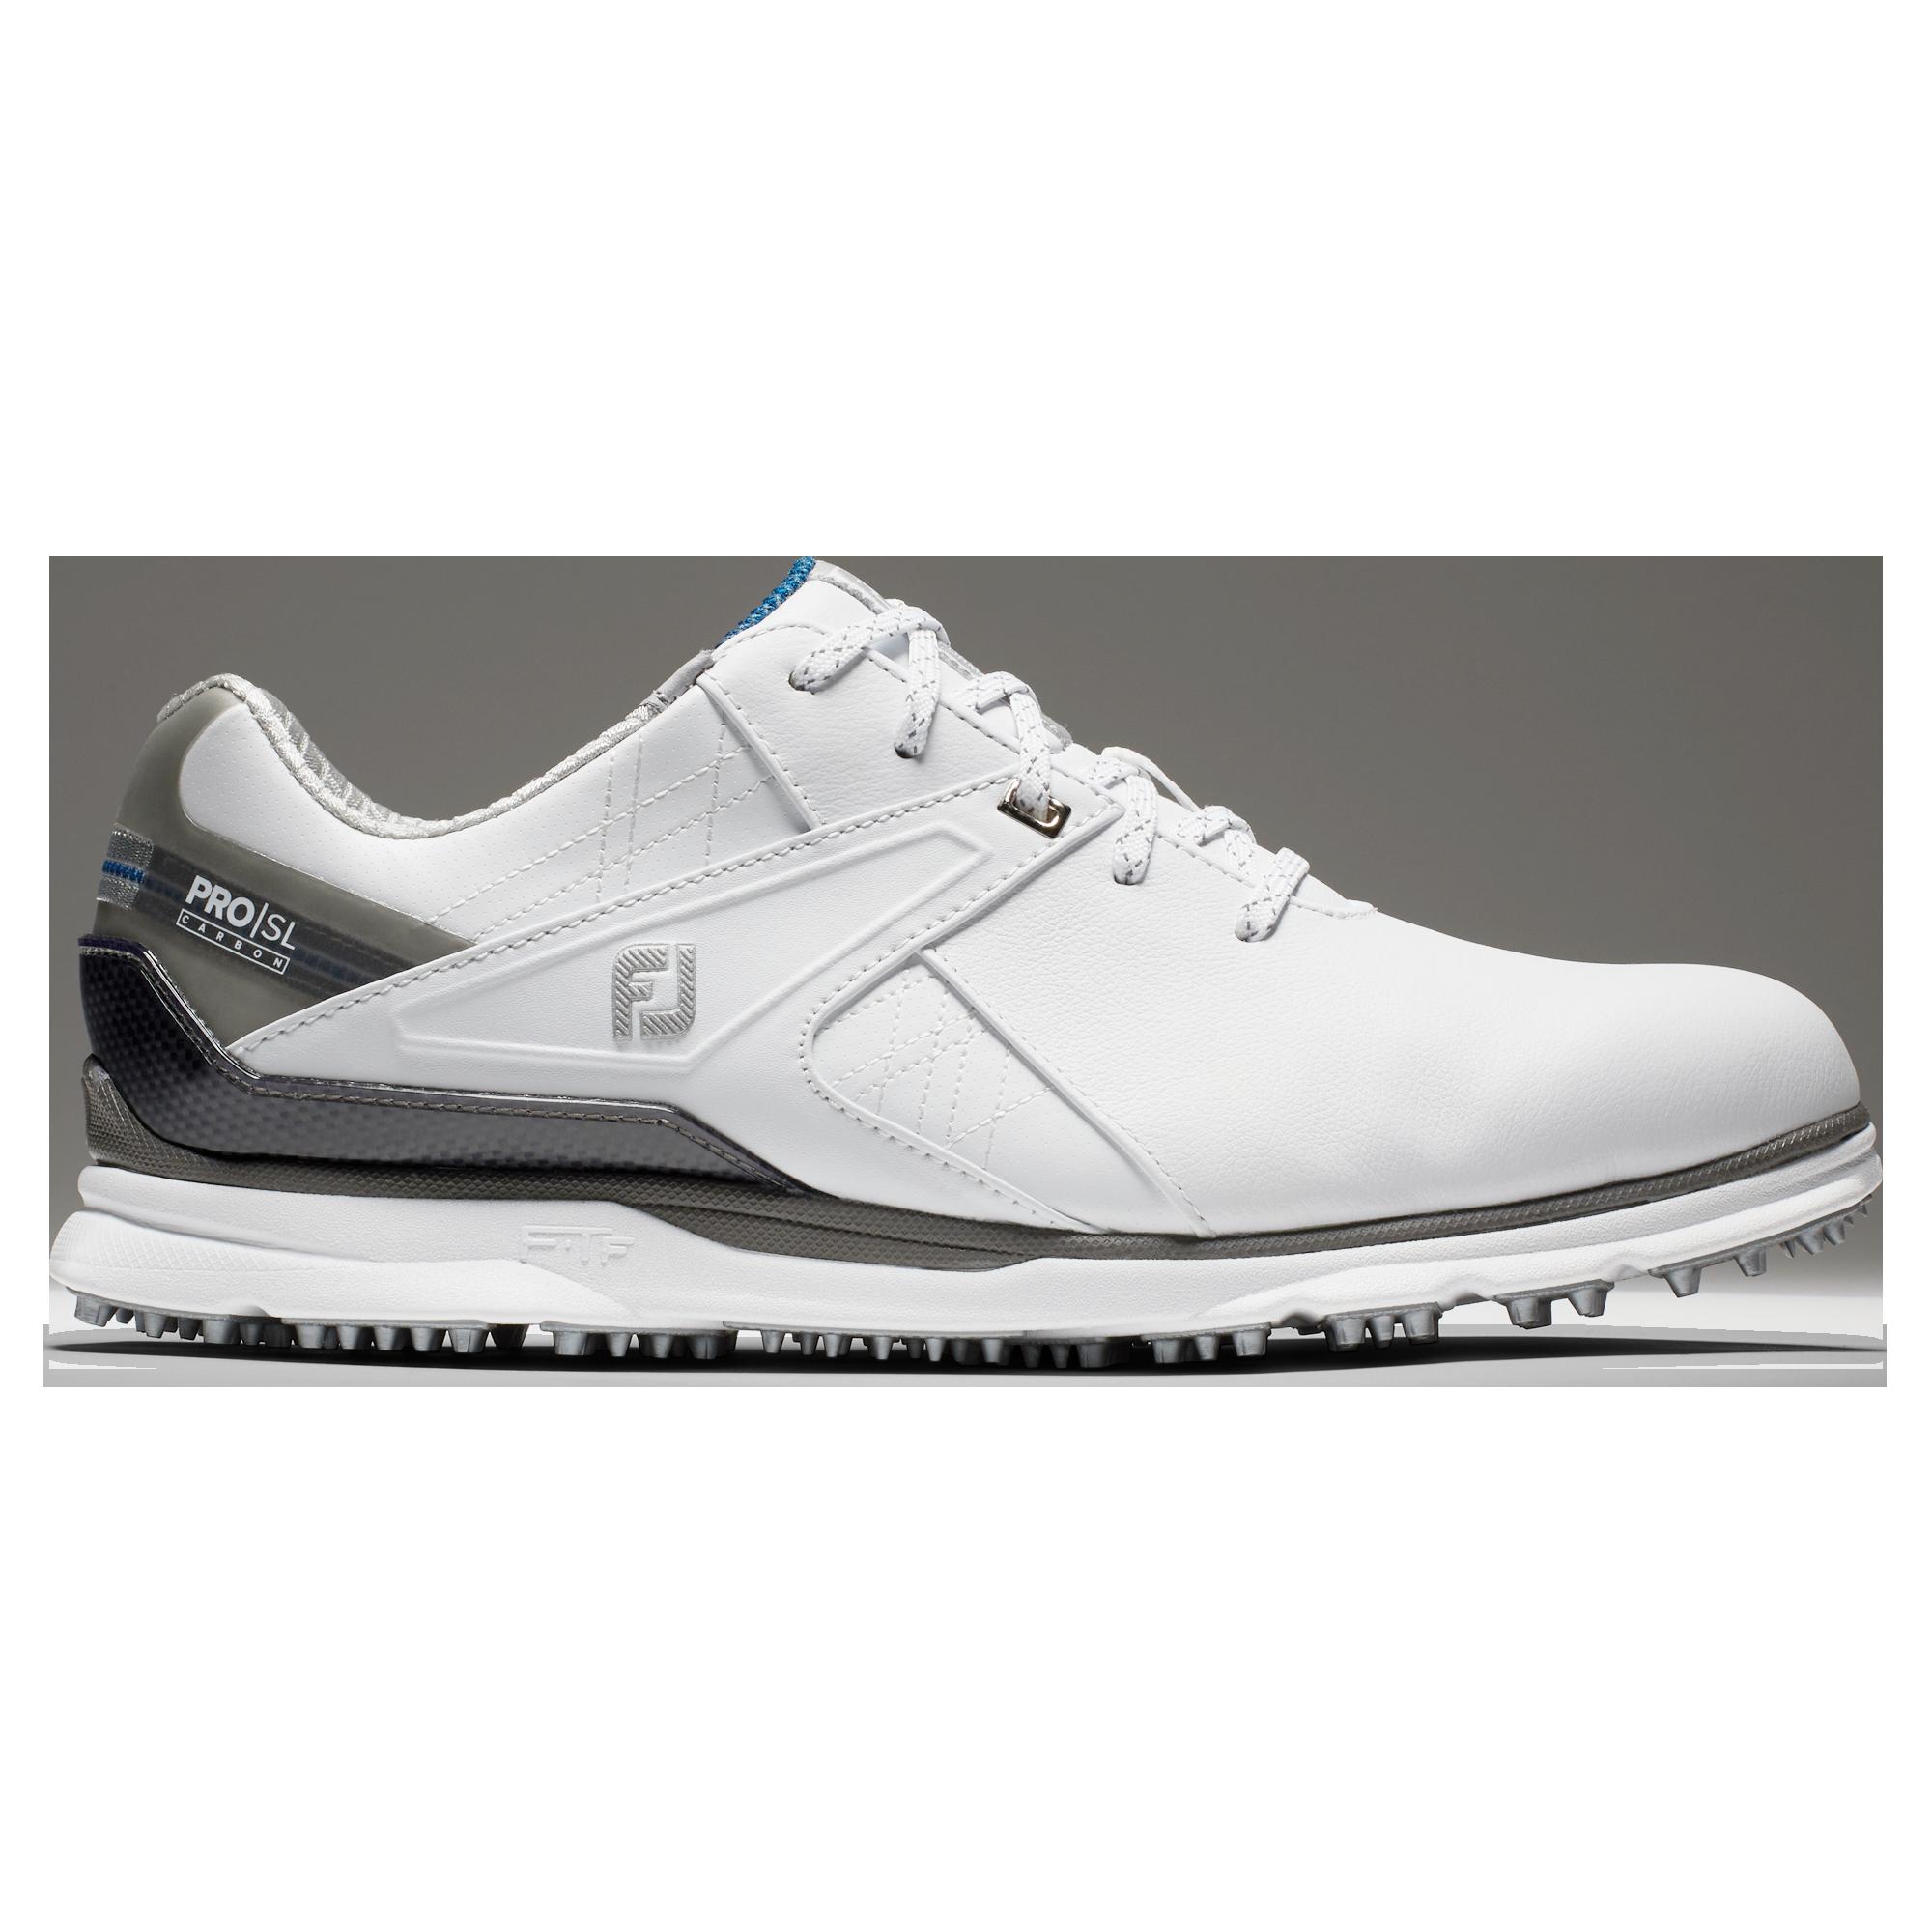 Men's Narrow Golf Shoes | The #1 Shoe